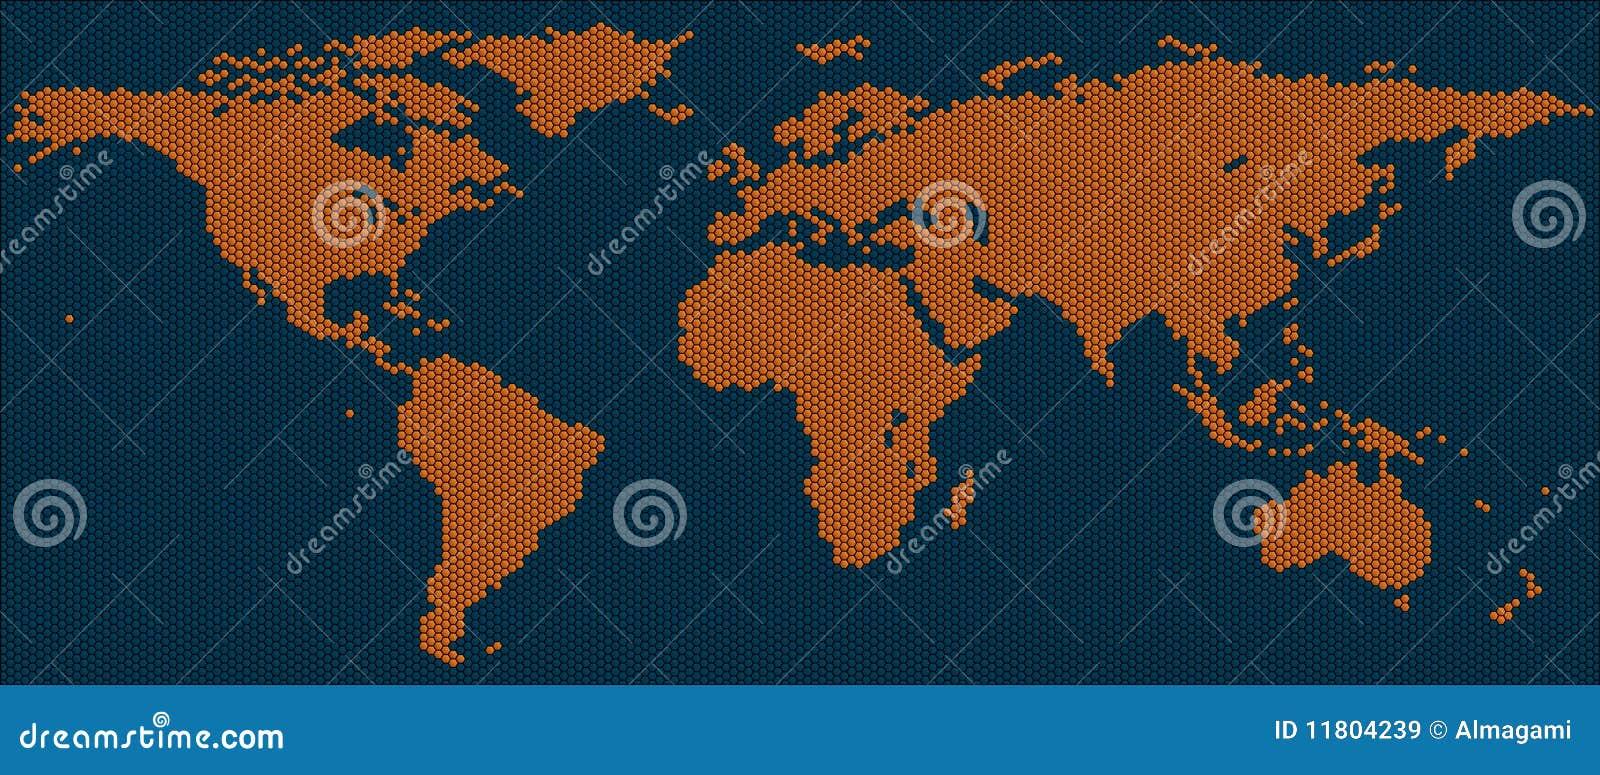 World Map Of Hexagon Tiles Stock Illustration Image Of